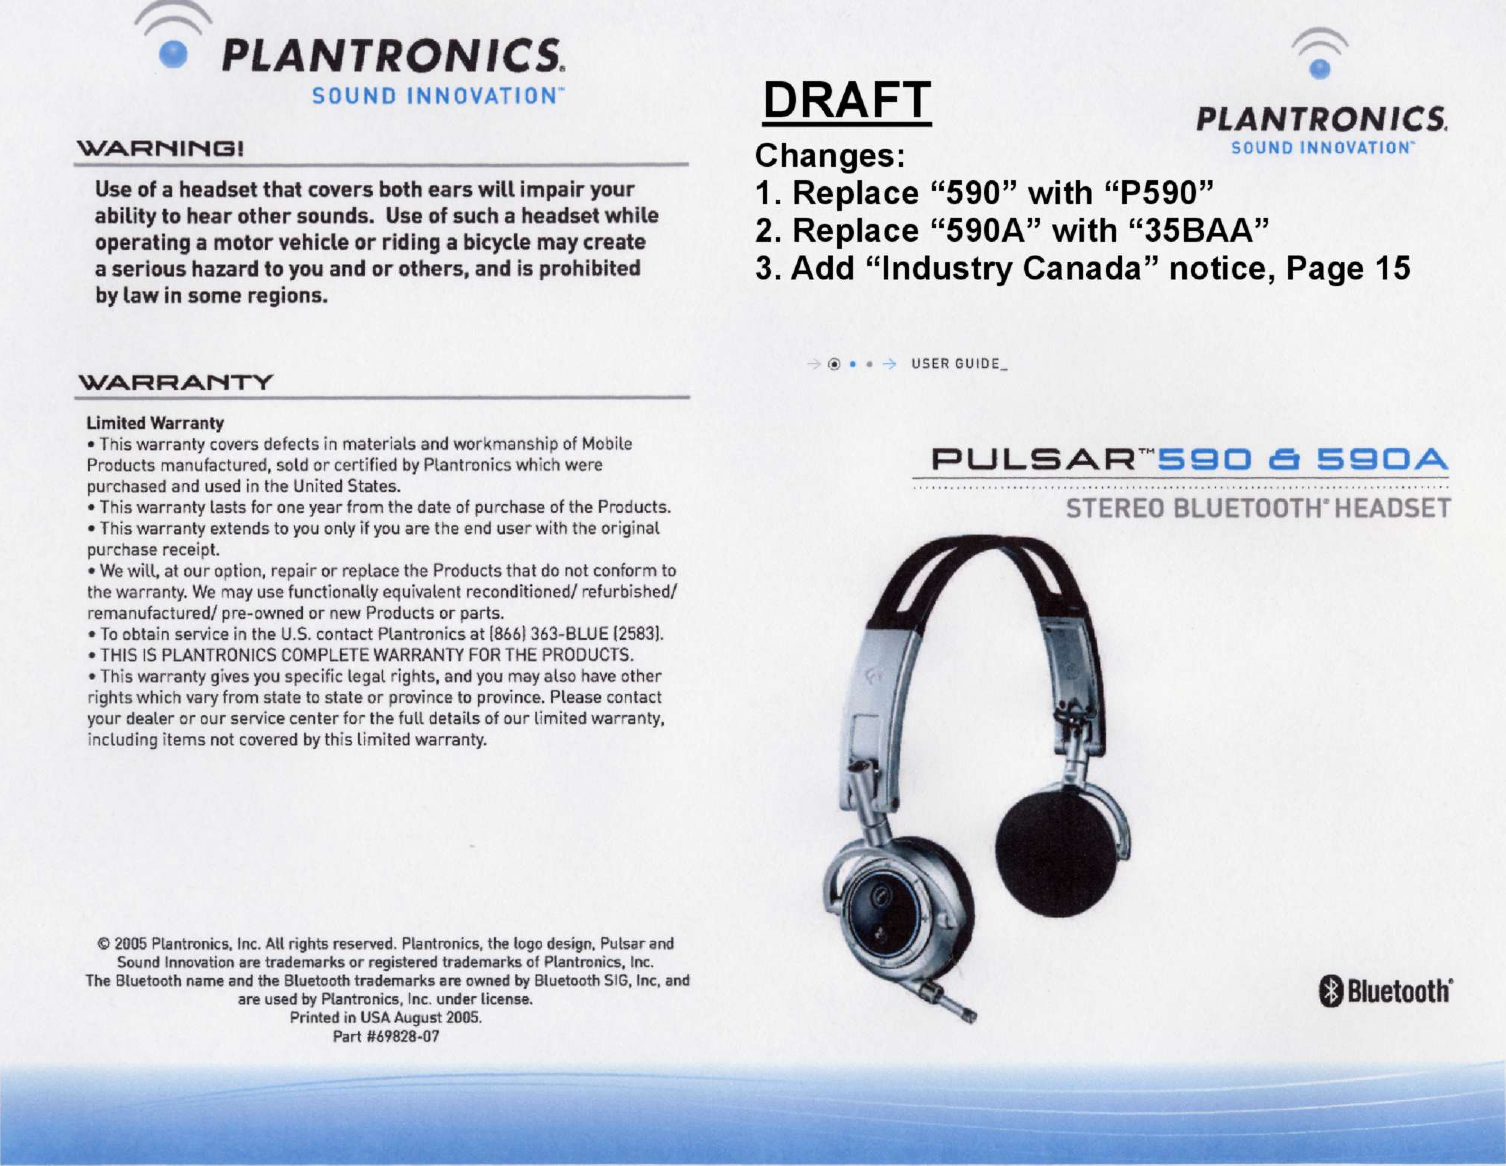 Plantronics P590 Bluetooth Headset User Manual